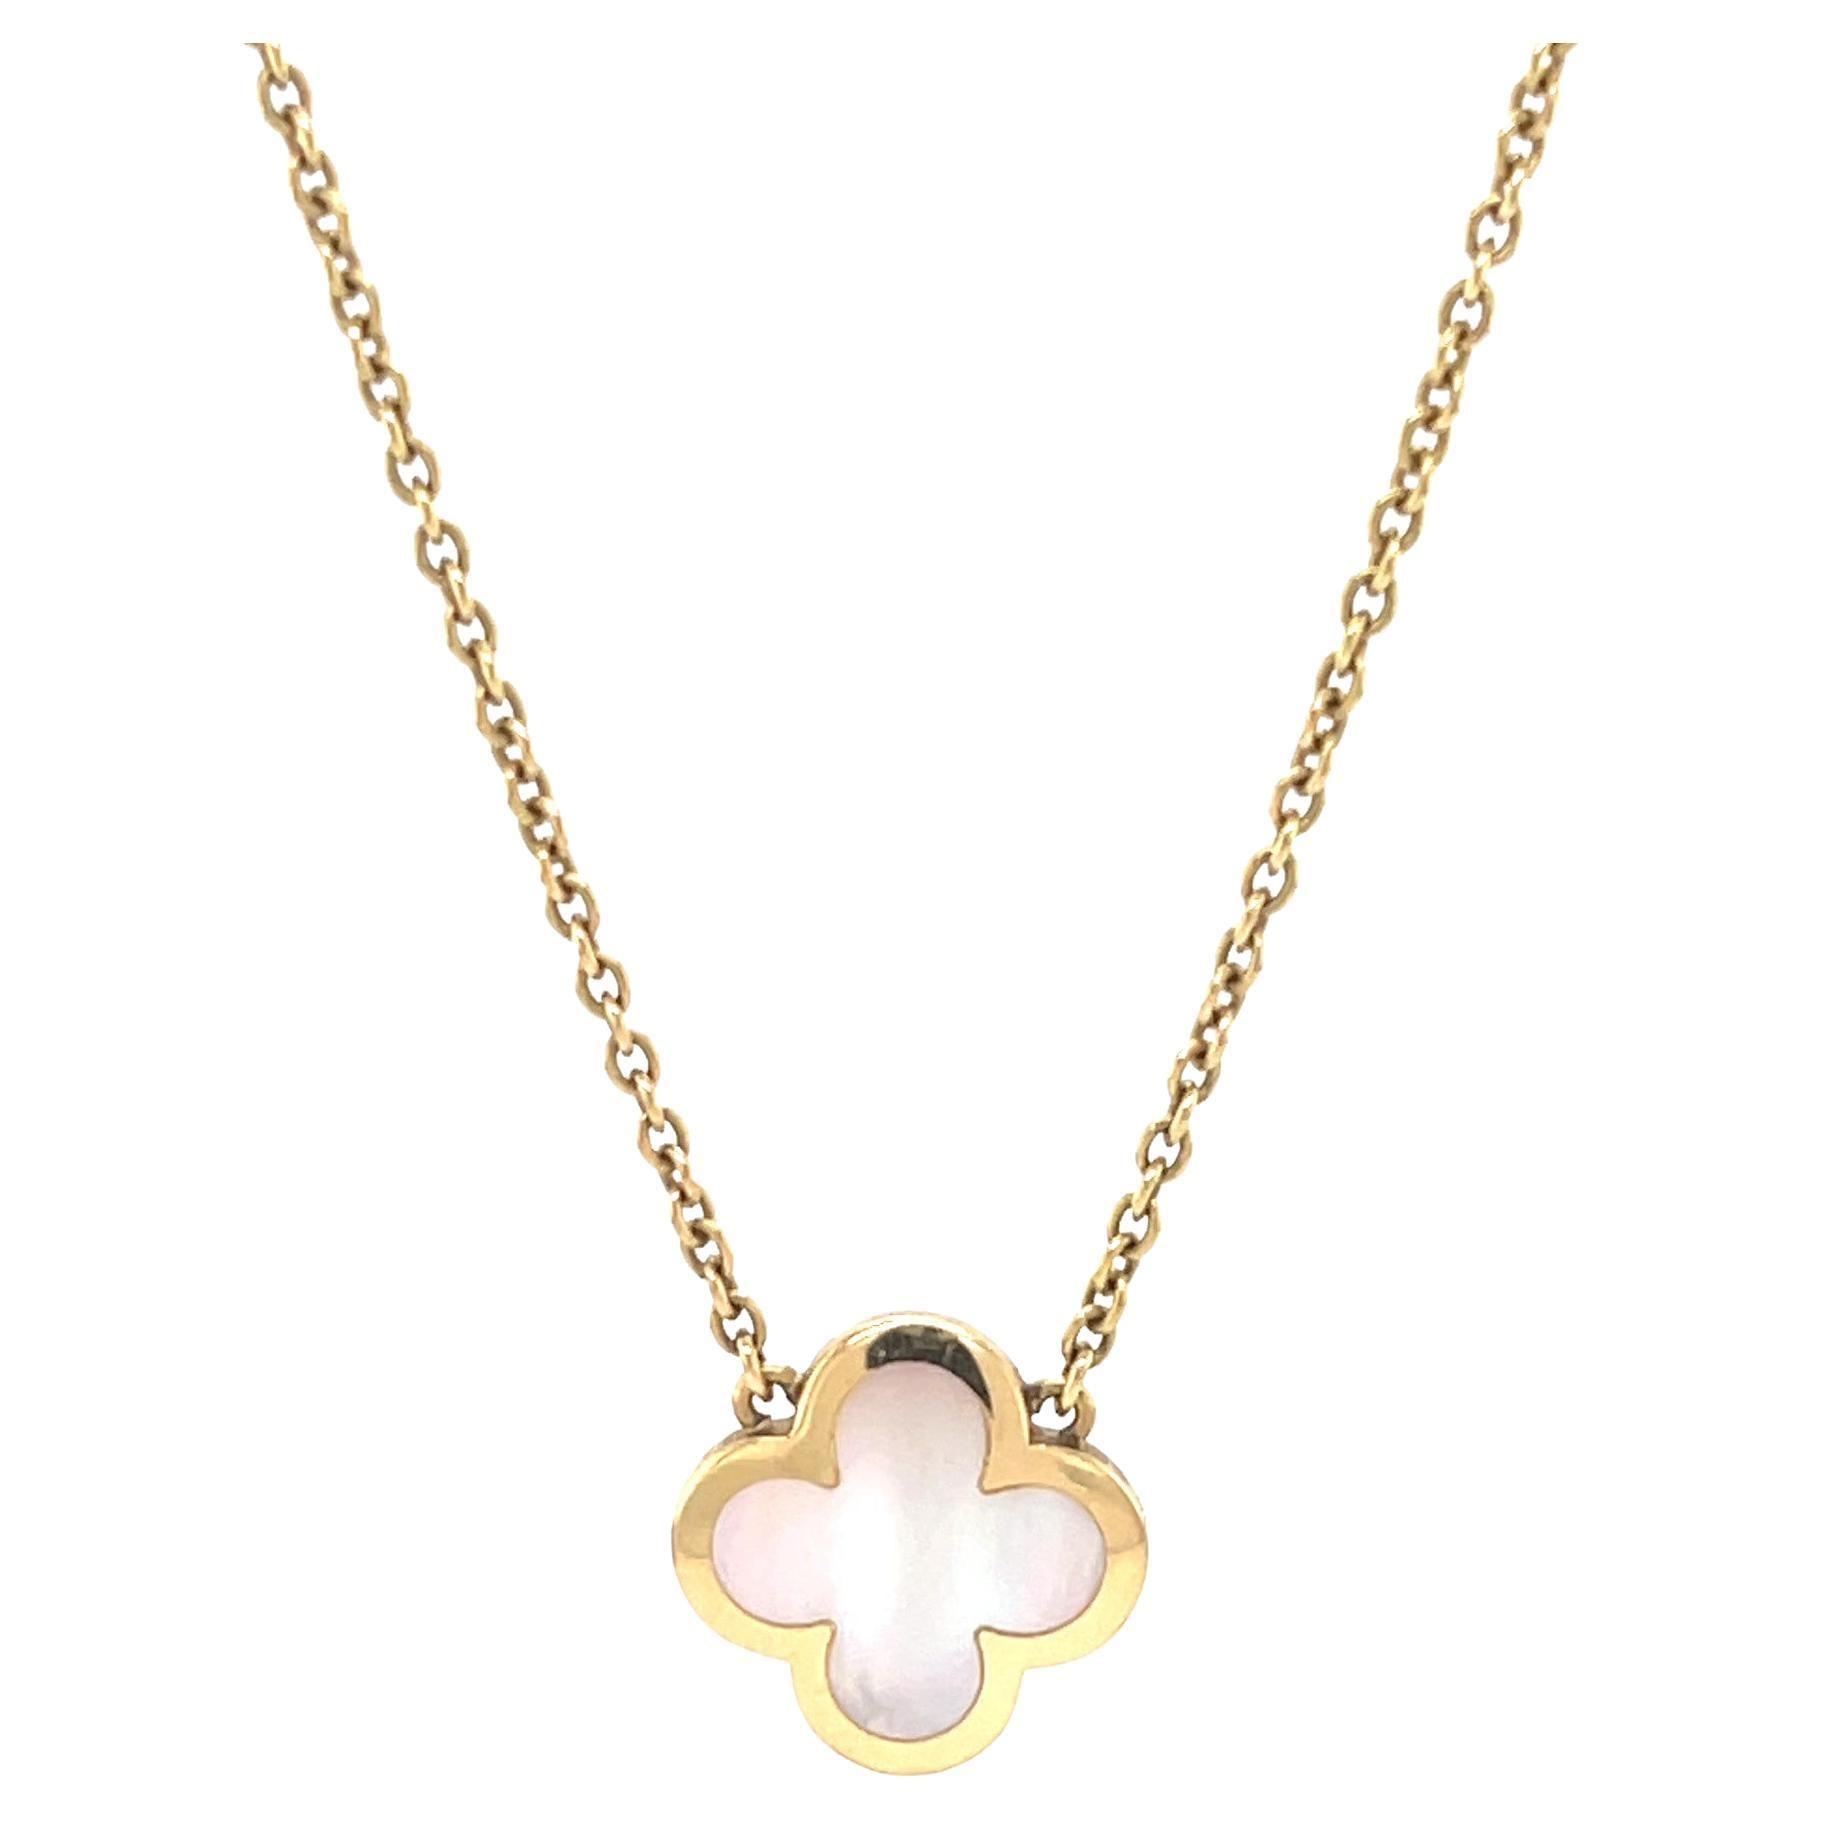 Van Cleef & Arpels Pure Alhambra Mother of Pearl 18 Karat Gold Necklace